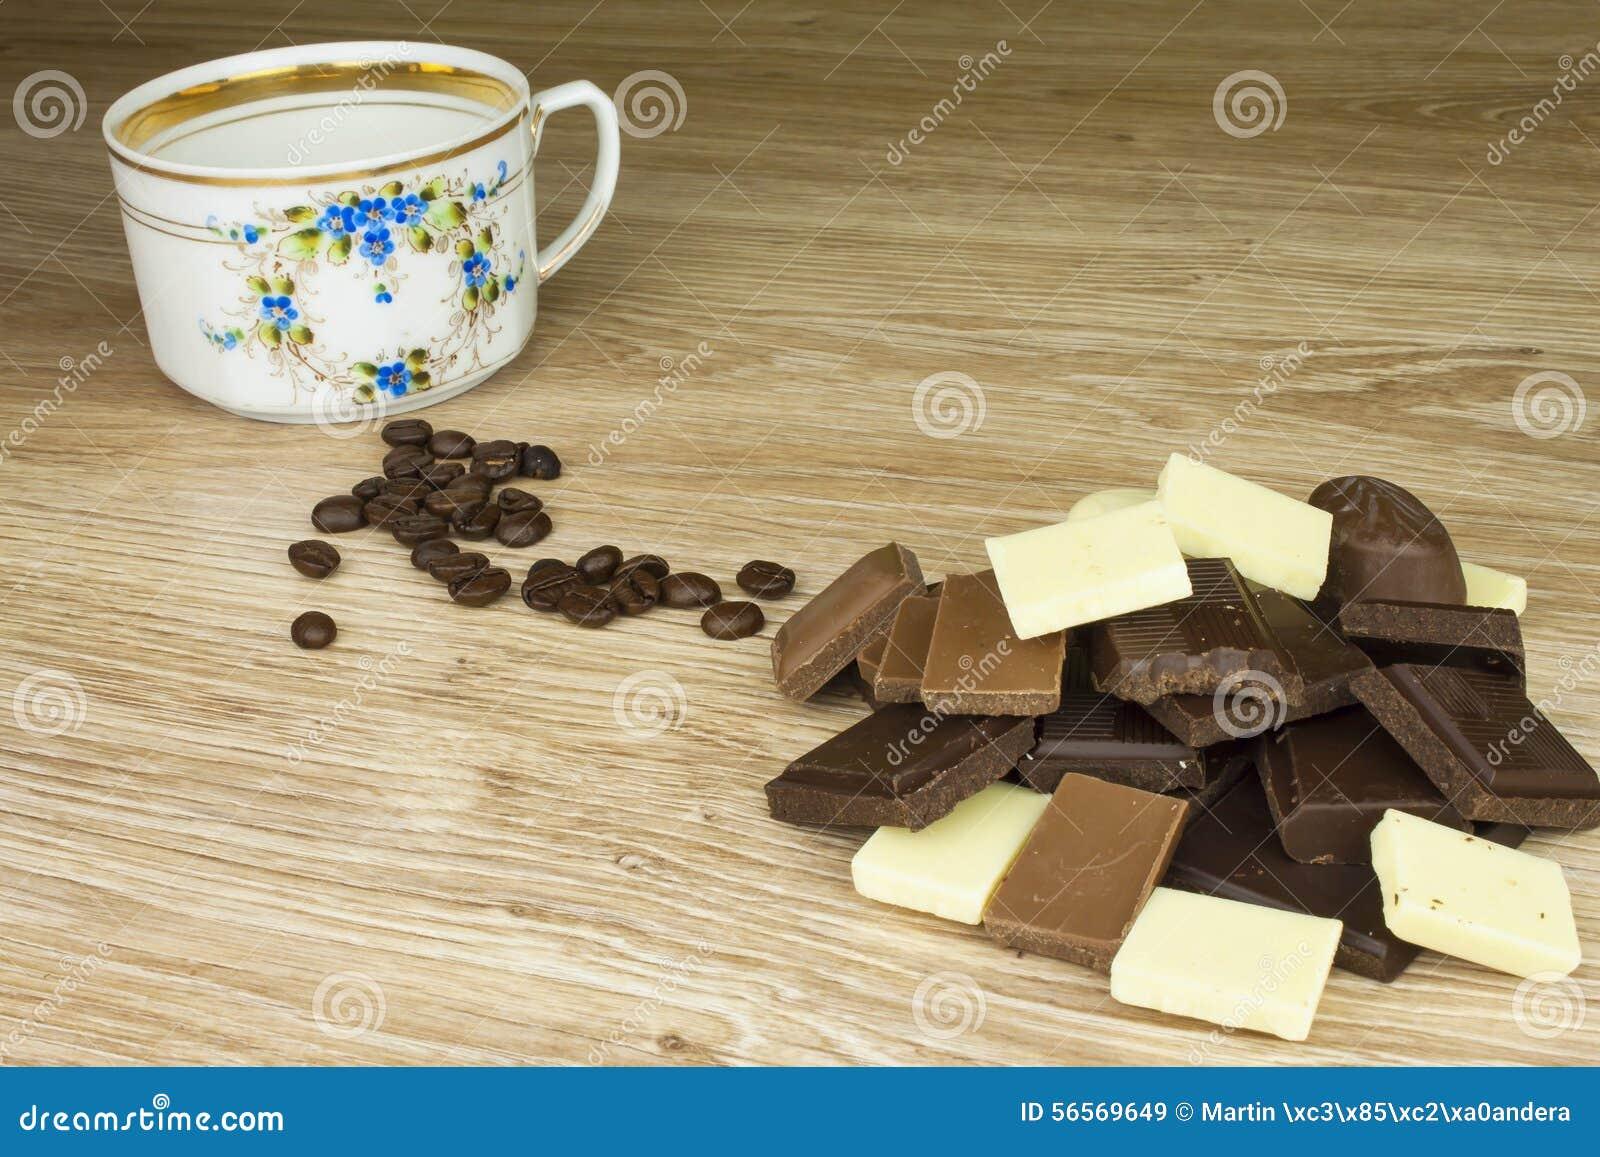 Download Κομμάτια της σοκολάτας σε έναν ξύλινο πίνακα Στοκ Εικόνα - εικόνα από γαστρονομικός, καφές: 56569649